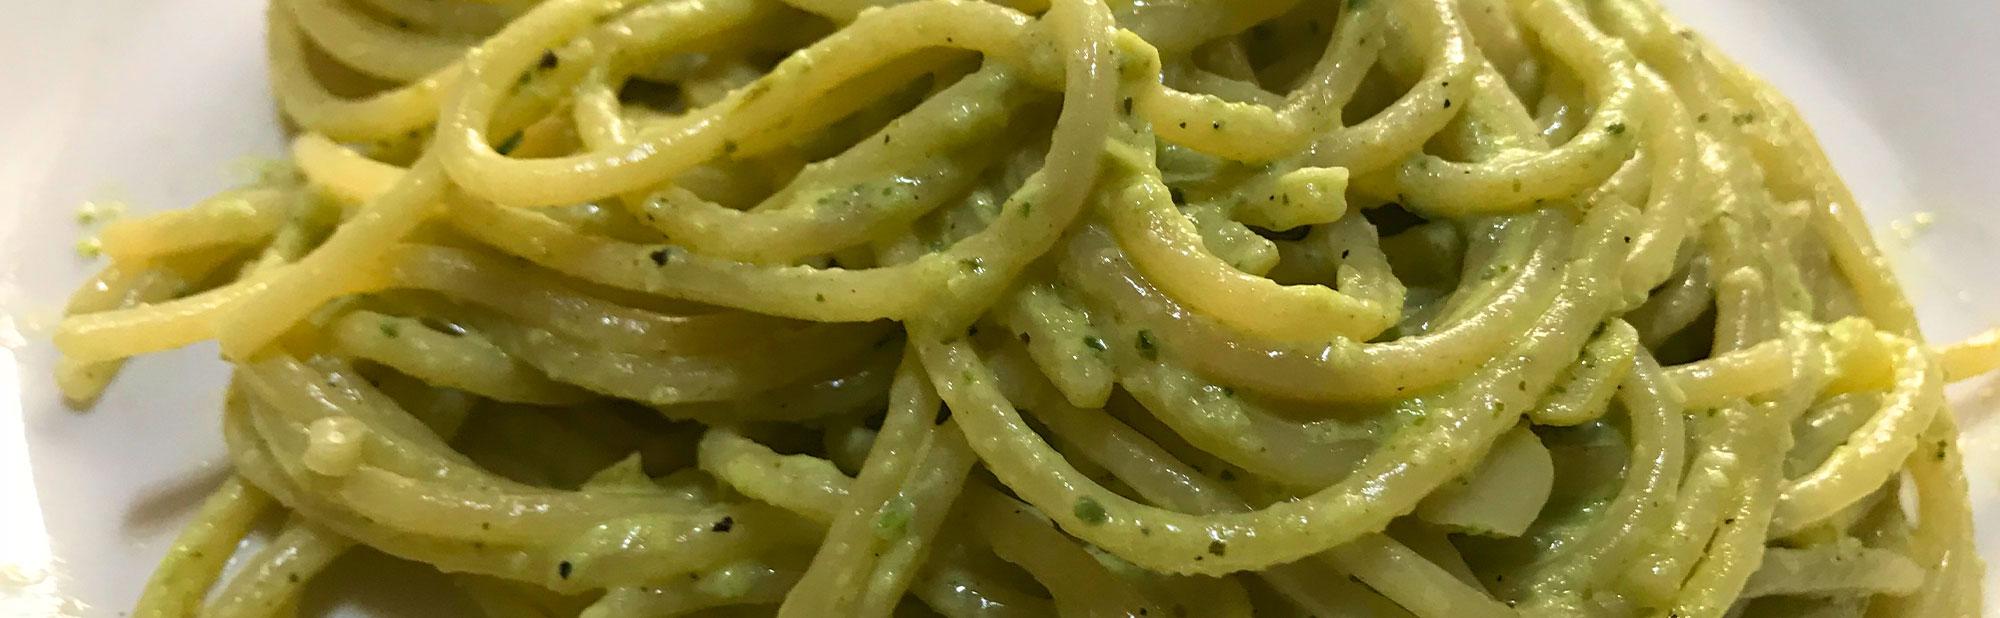 La Antojadera | Espagueti Poblano